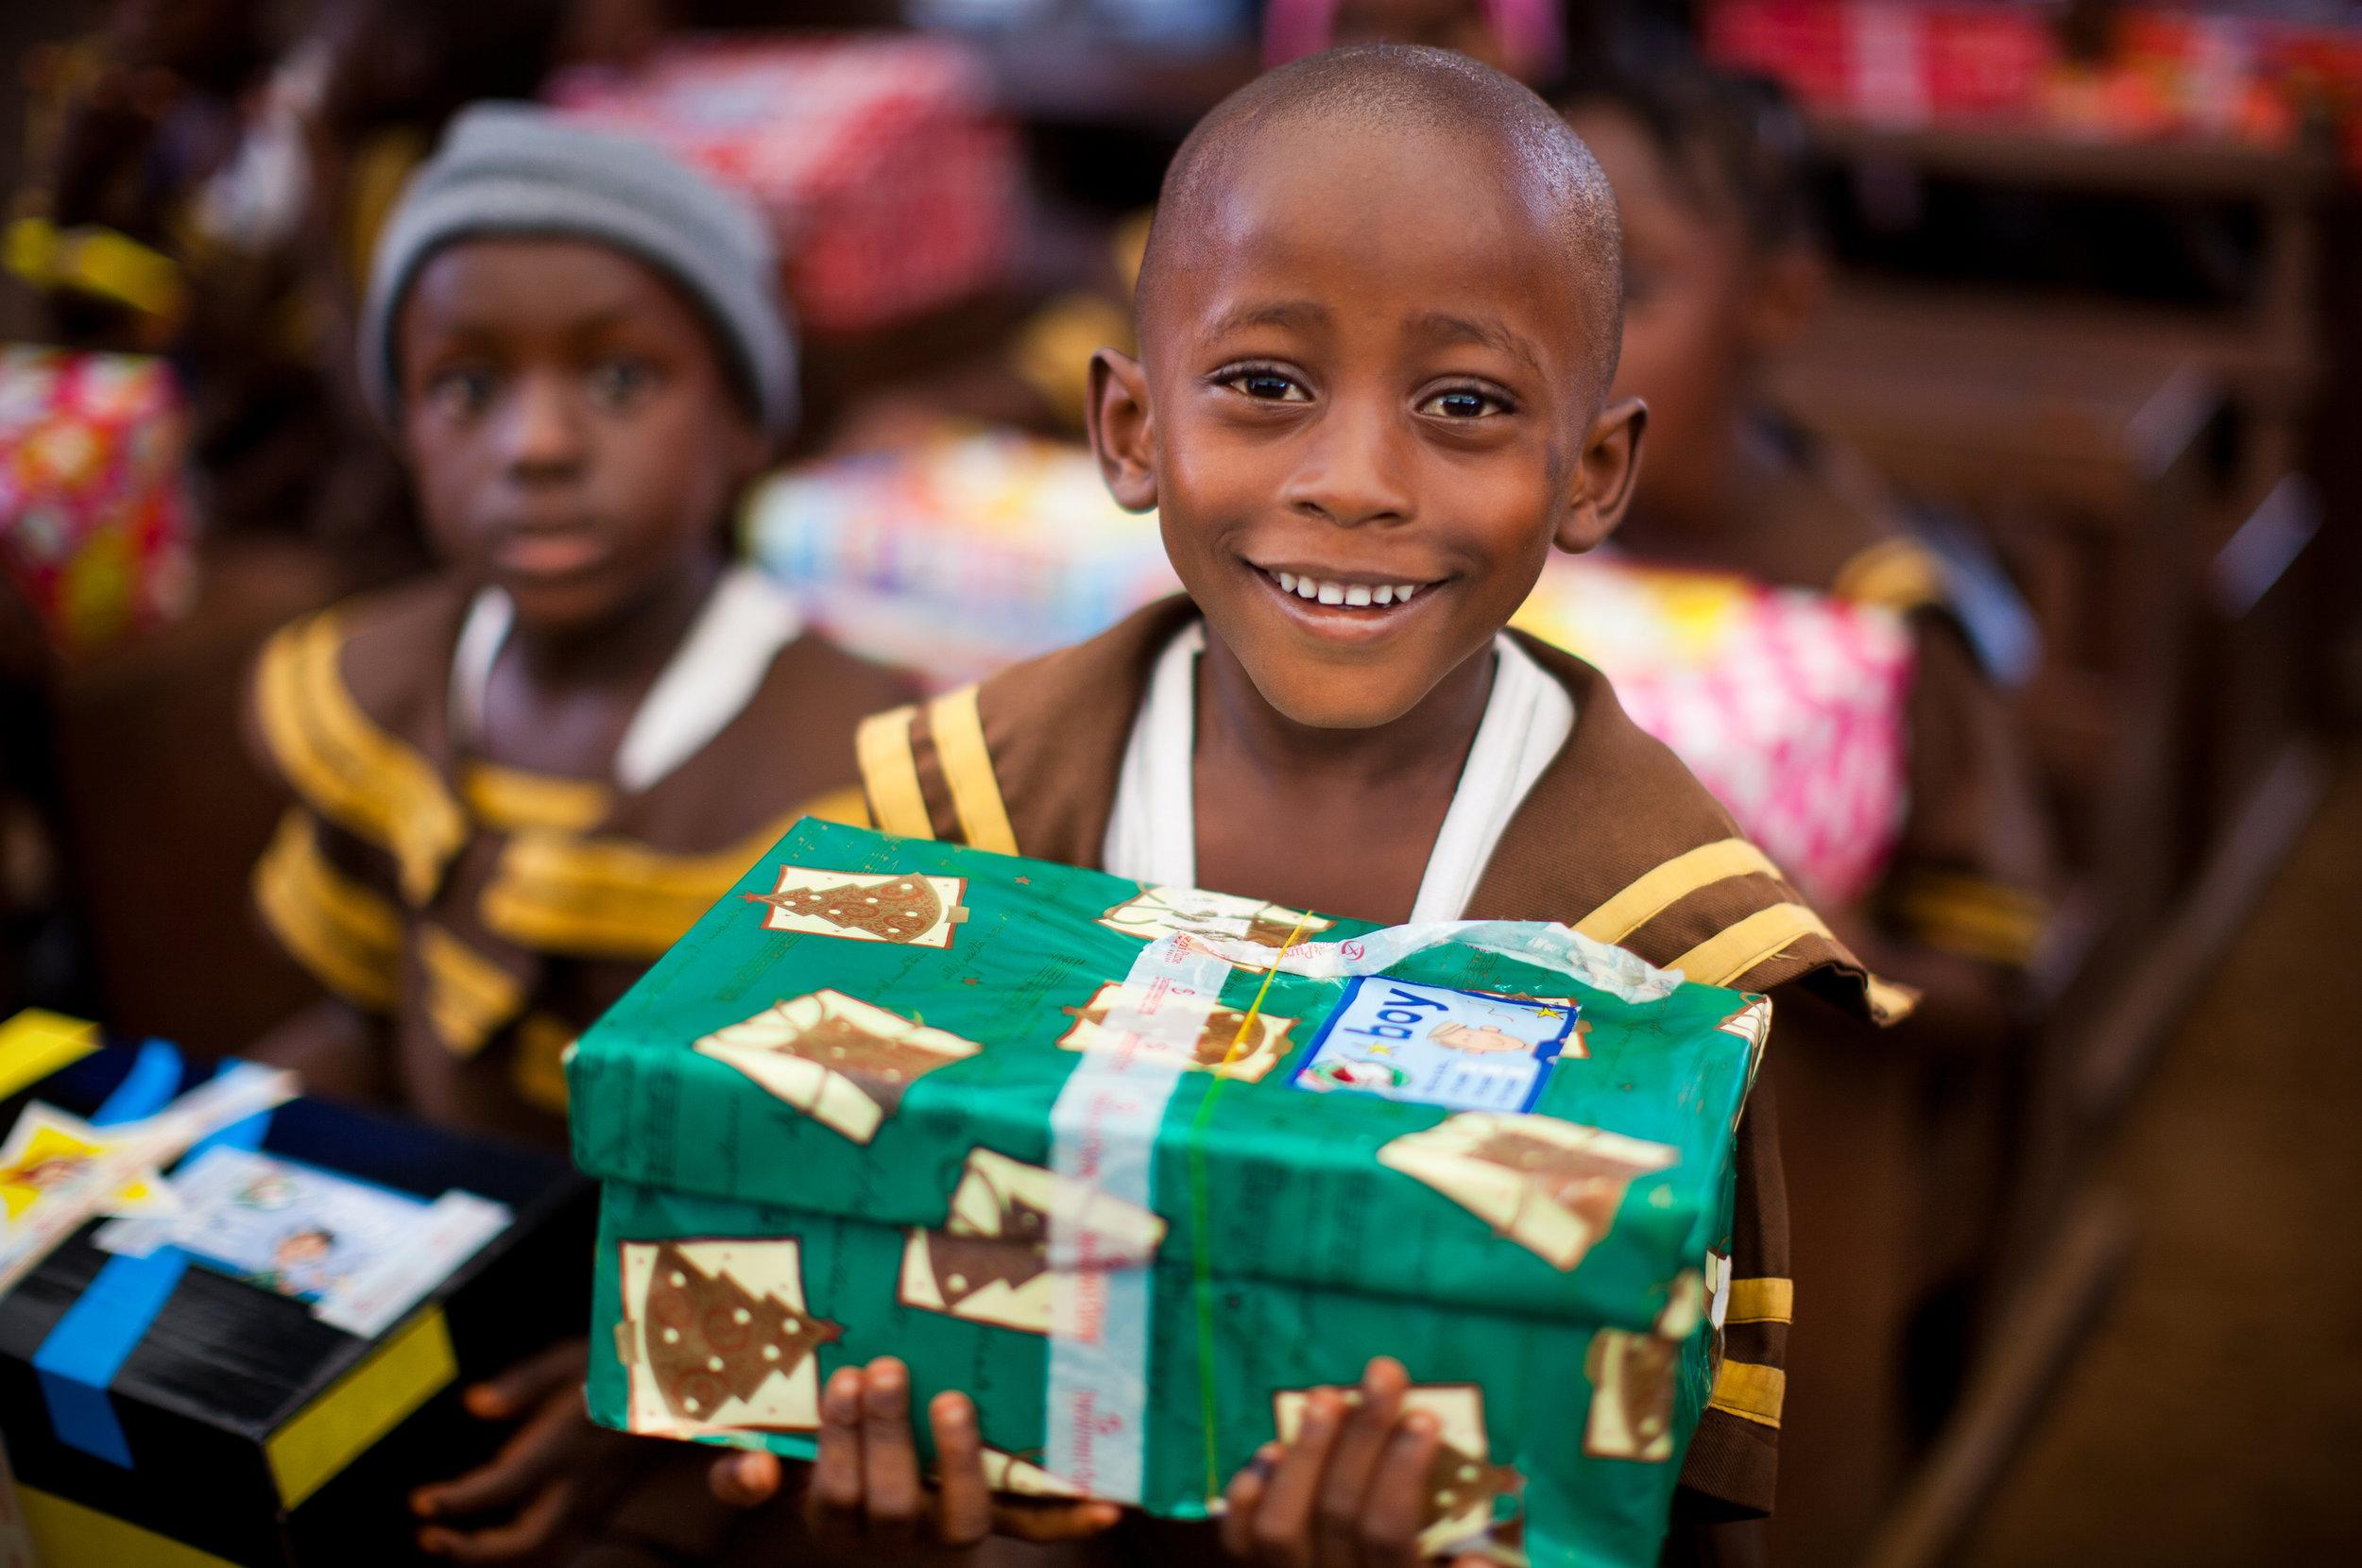 Shoebox distribution in Liberia